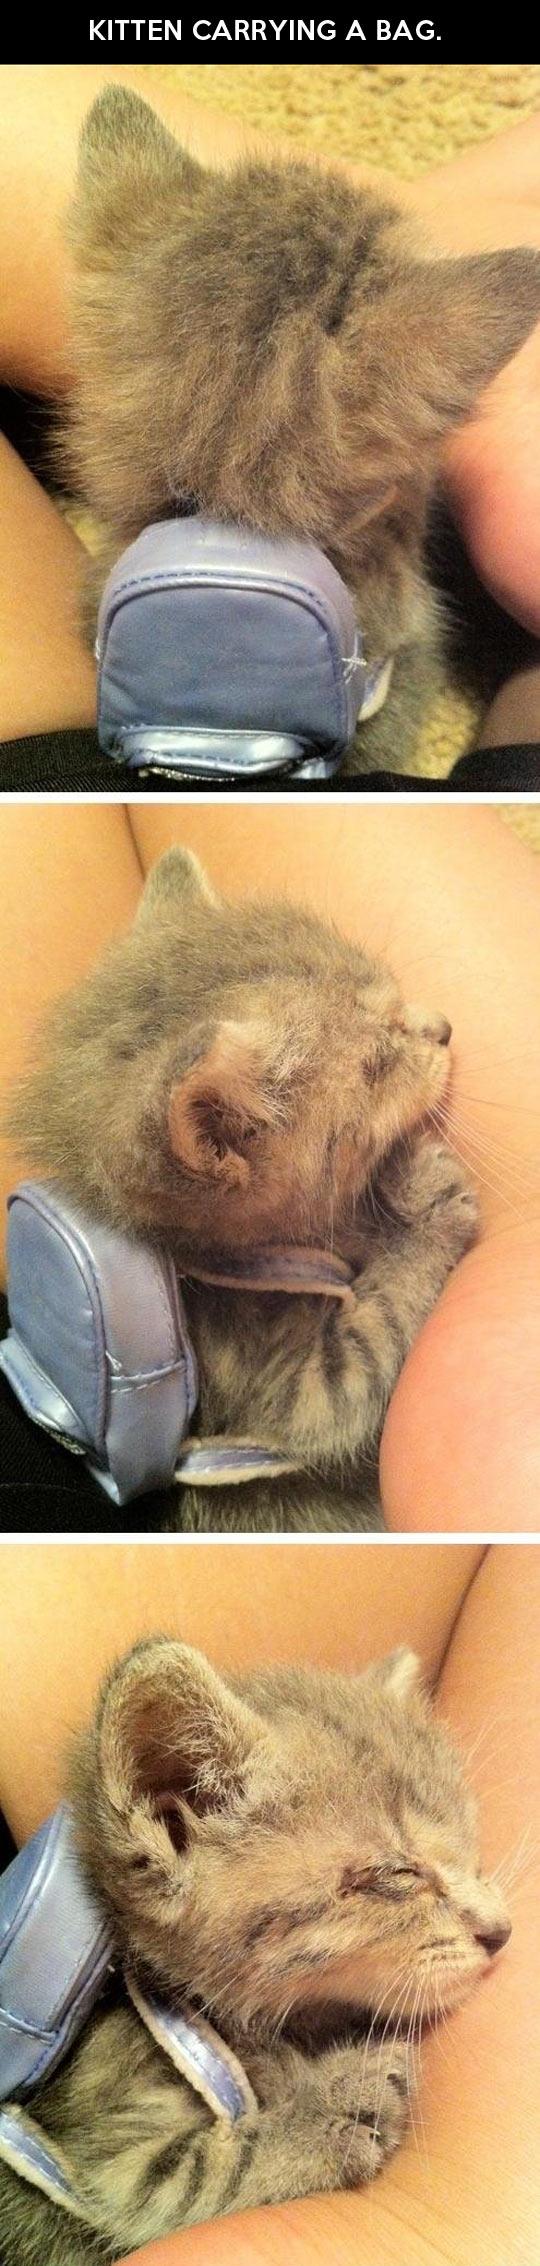 funny-kitten-bag-fur-baby